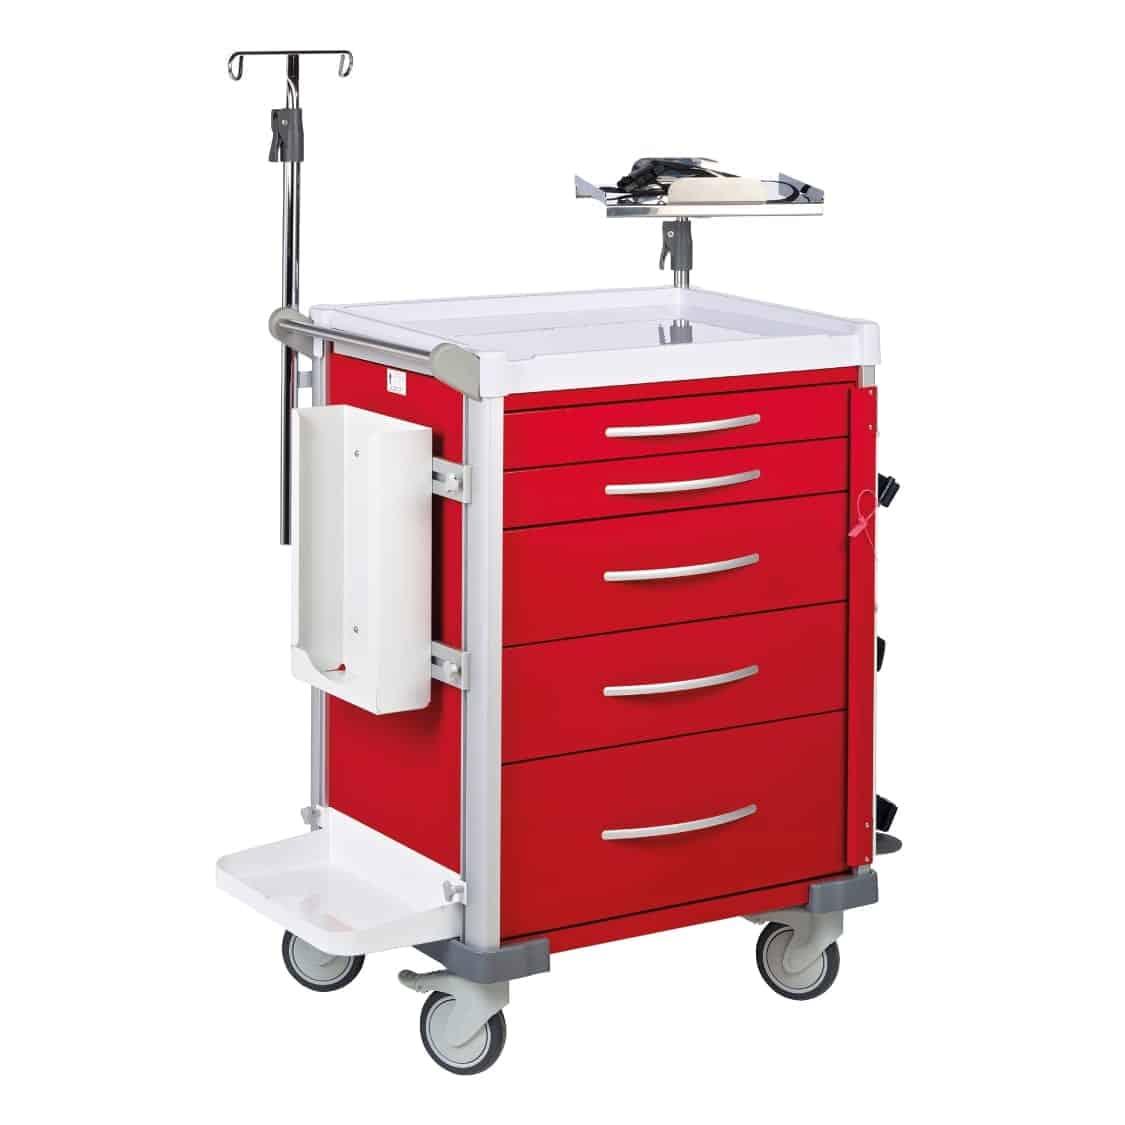 LX Resuscitation Trolley 2